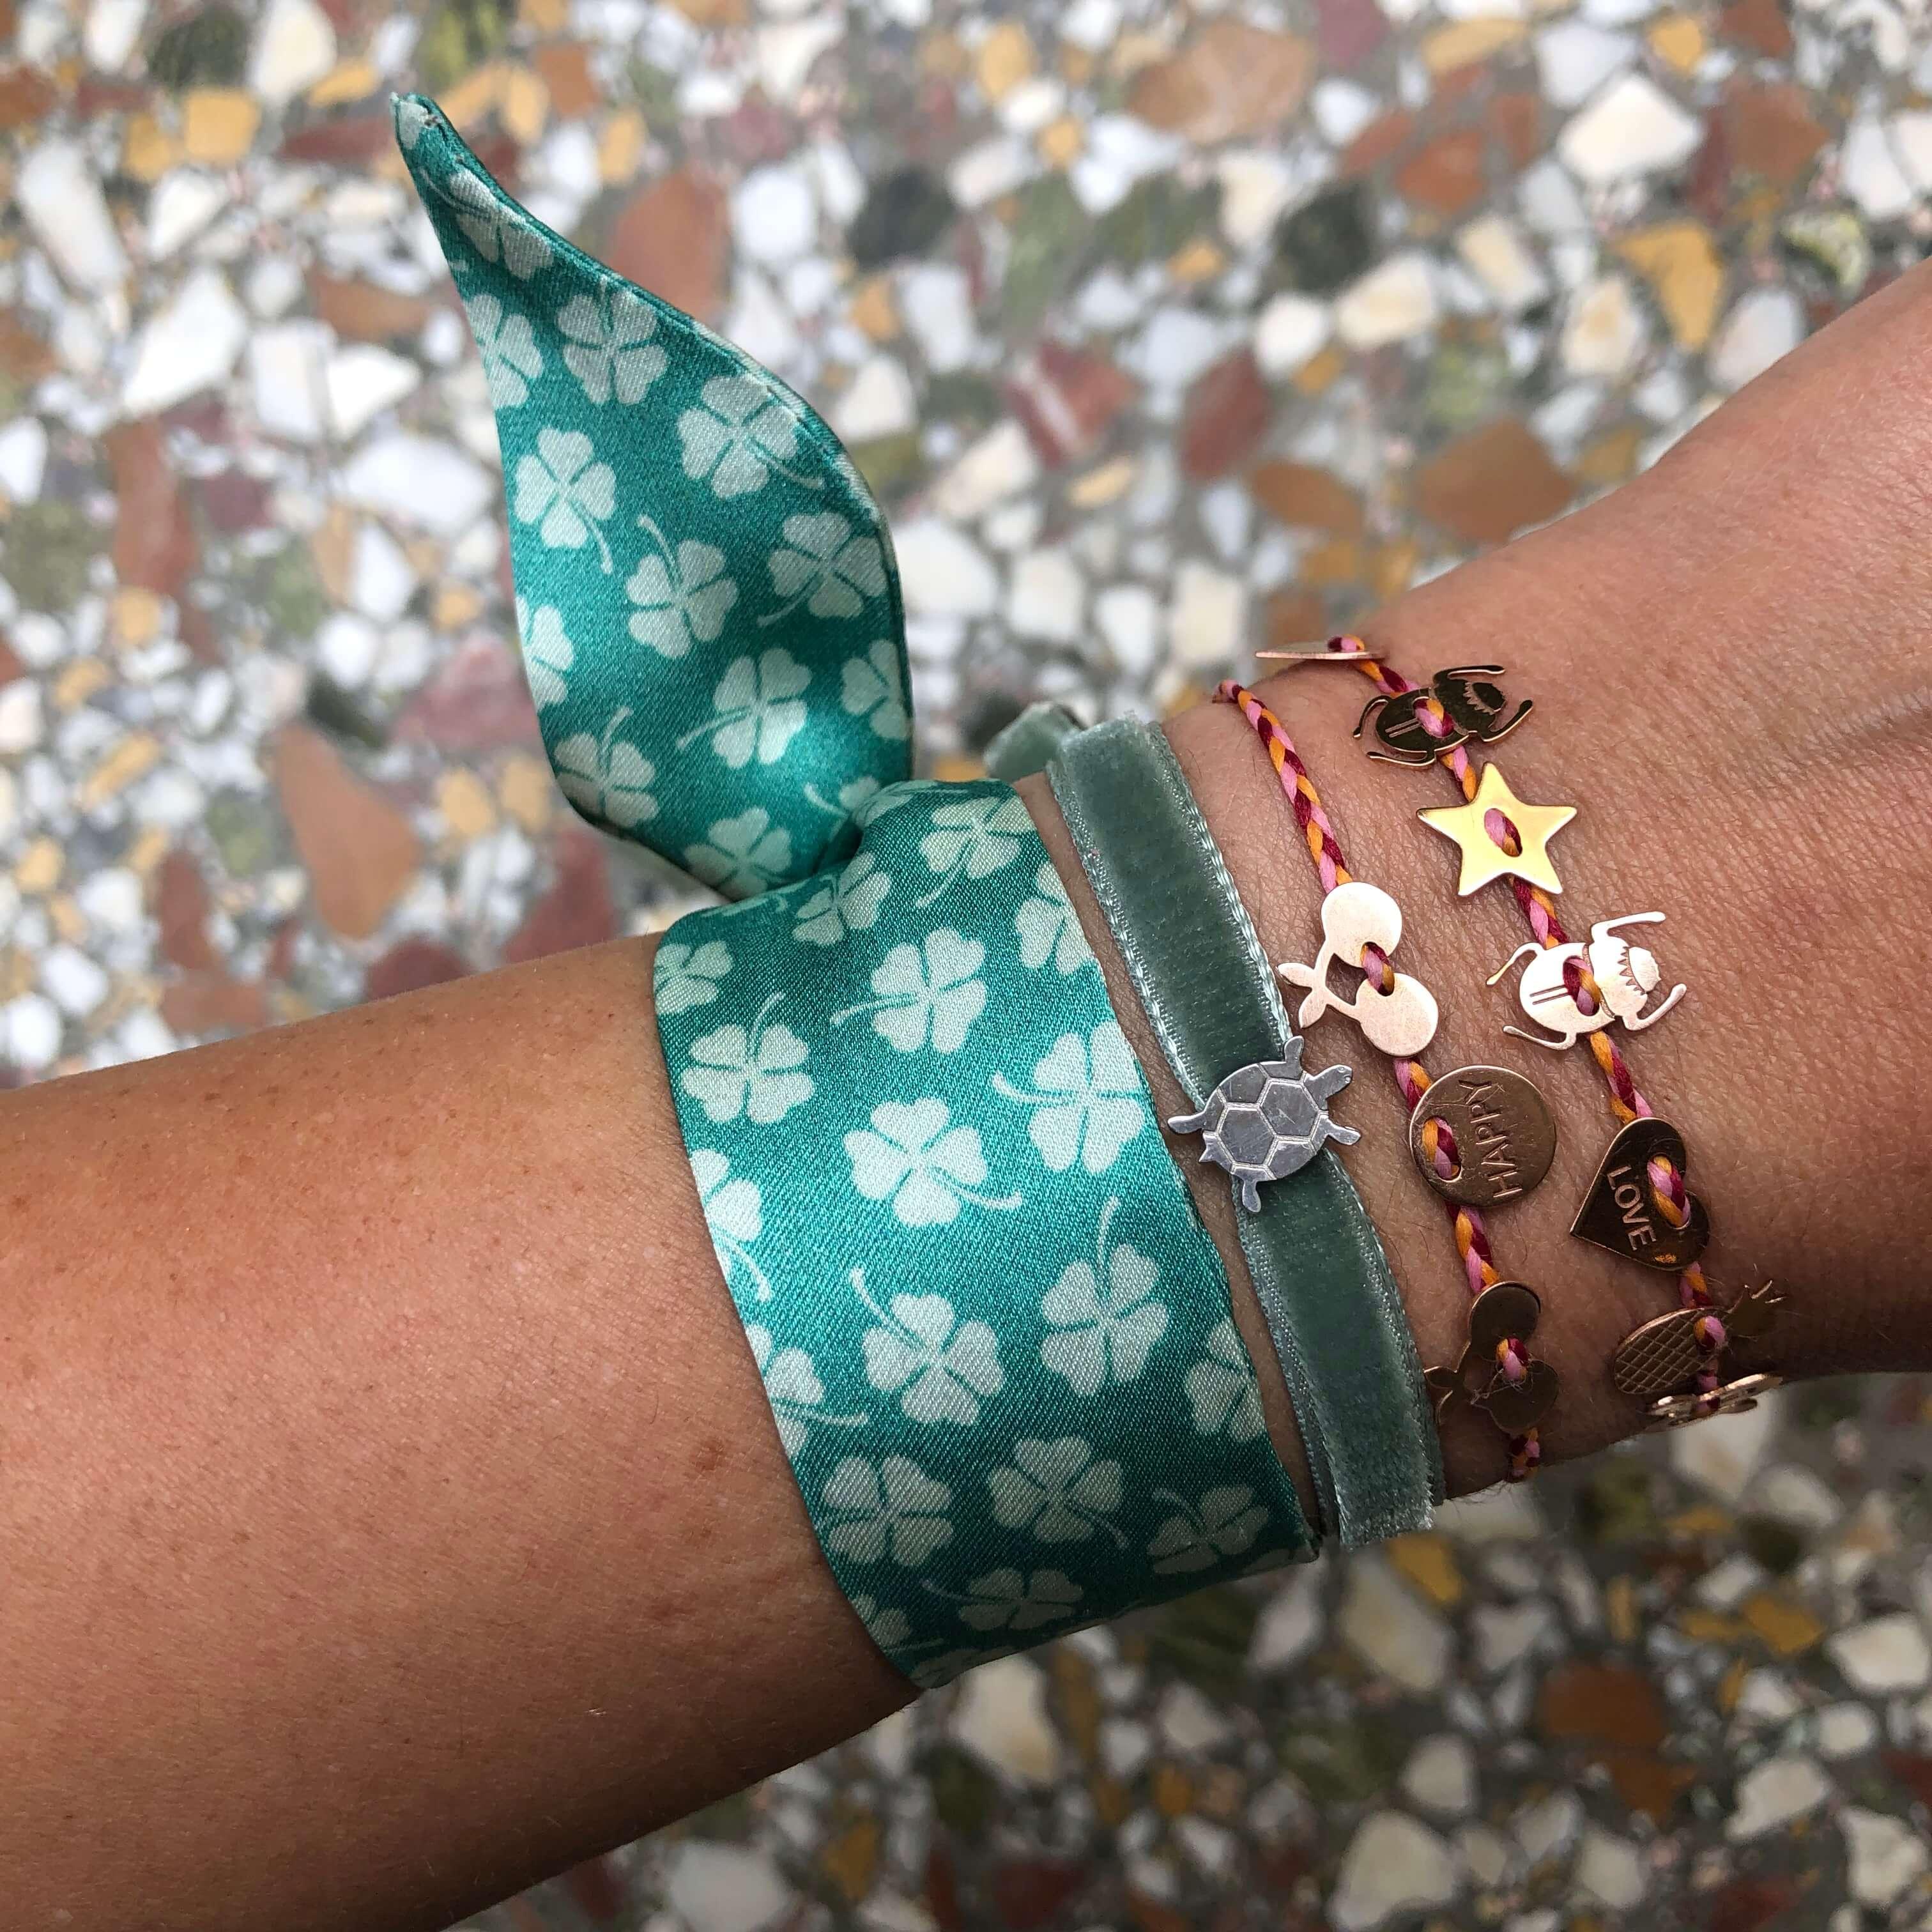 bracelet porte-bonheur - bracelet femme tendance - bracelet Chance - Cénélia